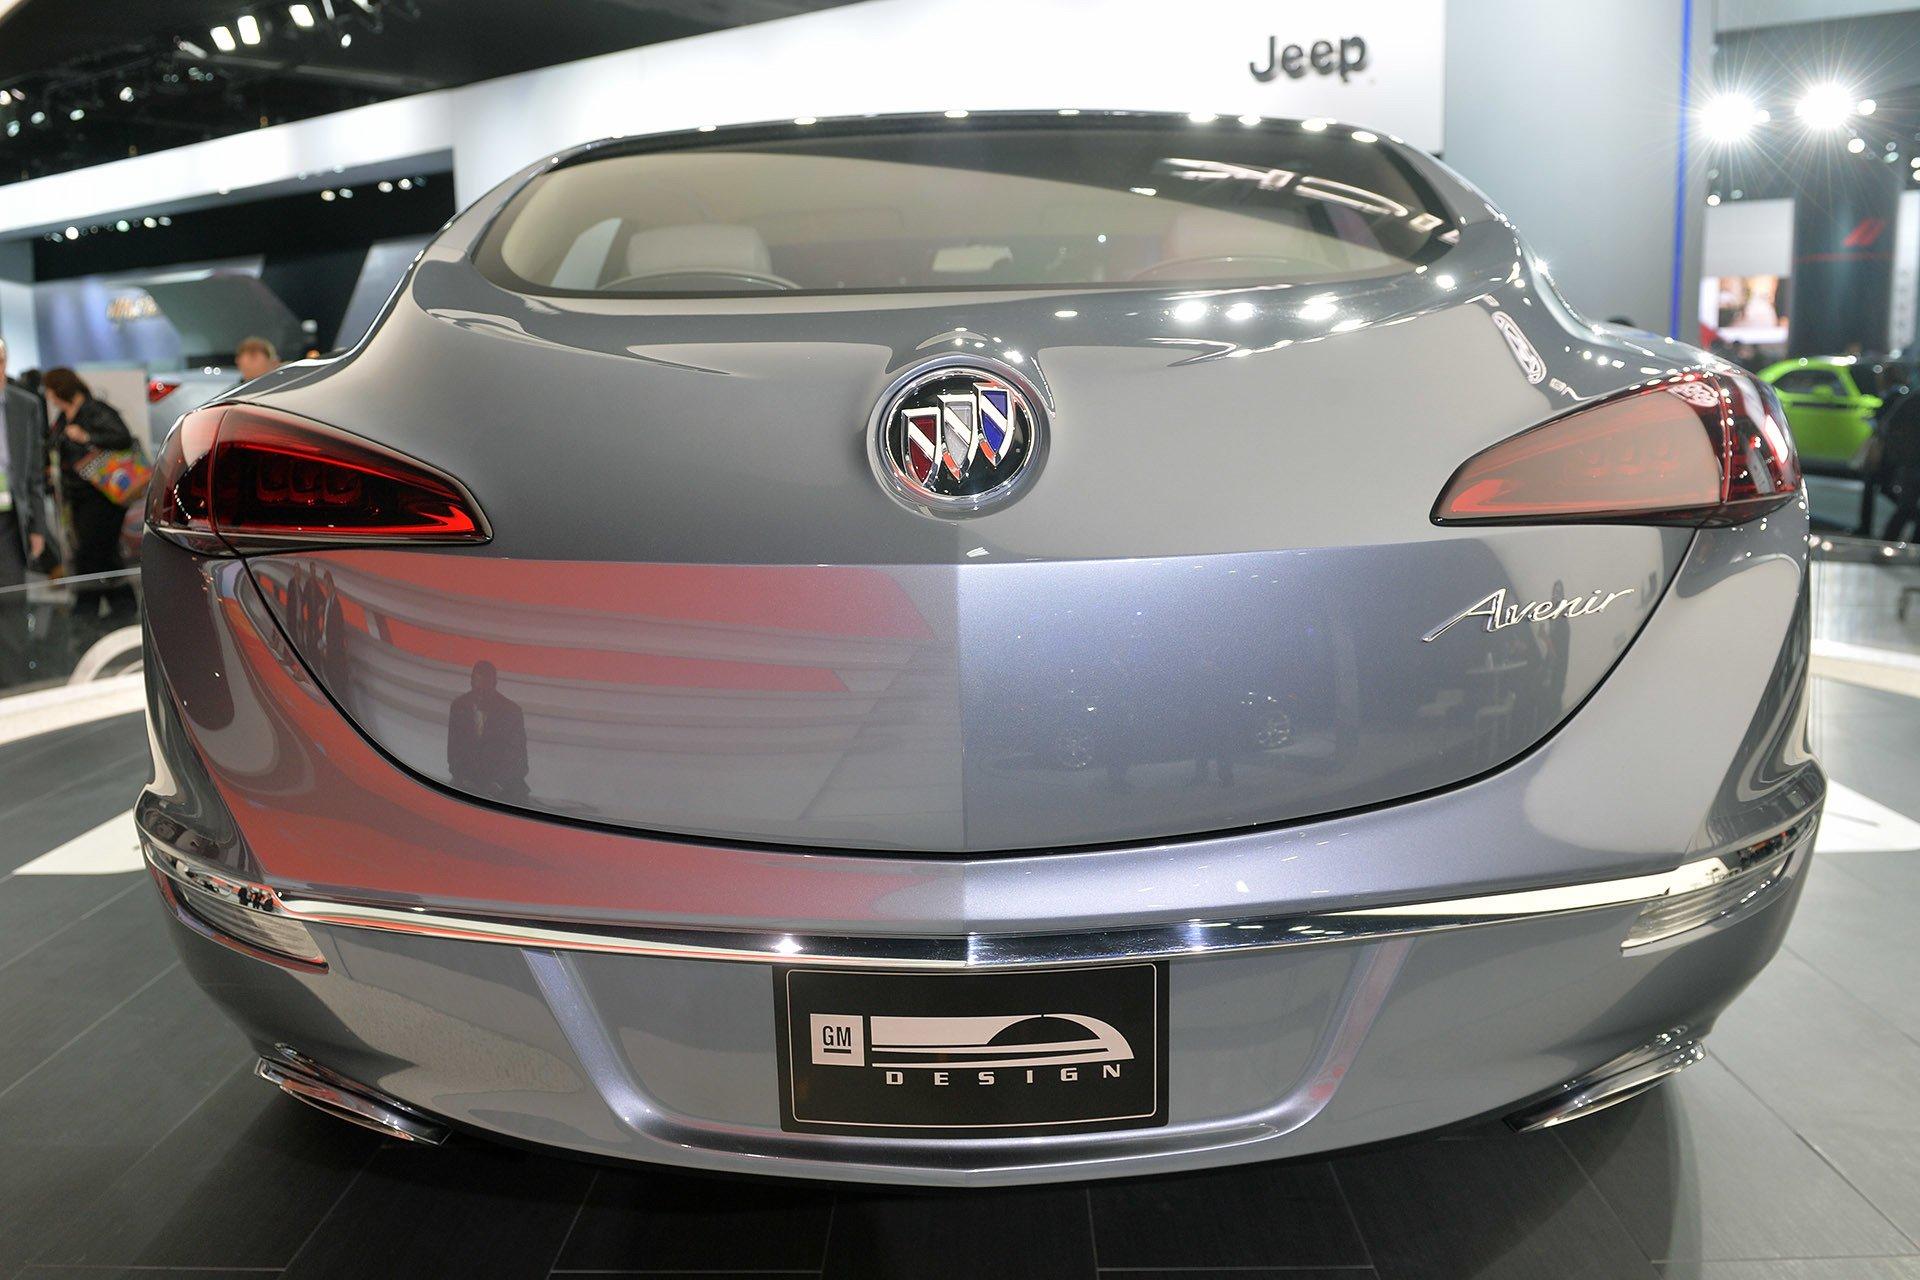 buick avenir concept detroit 2015 cars wallpaper 1920x1280 584038 wallpaperup. Black Bedroom Furniture Sets. Home Design Ideas